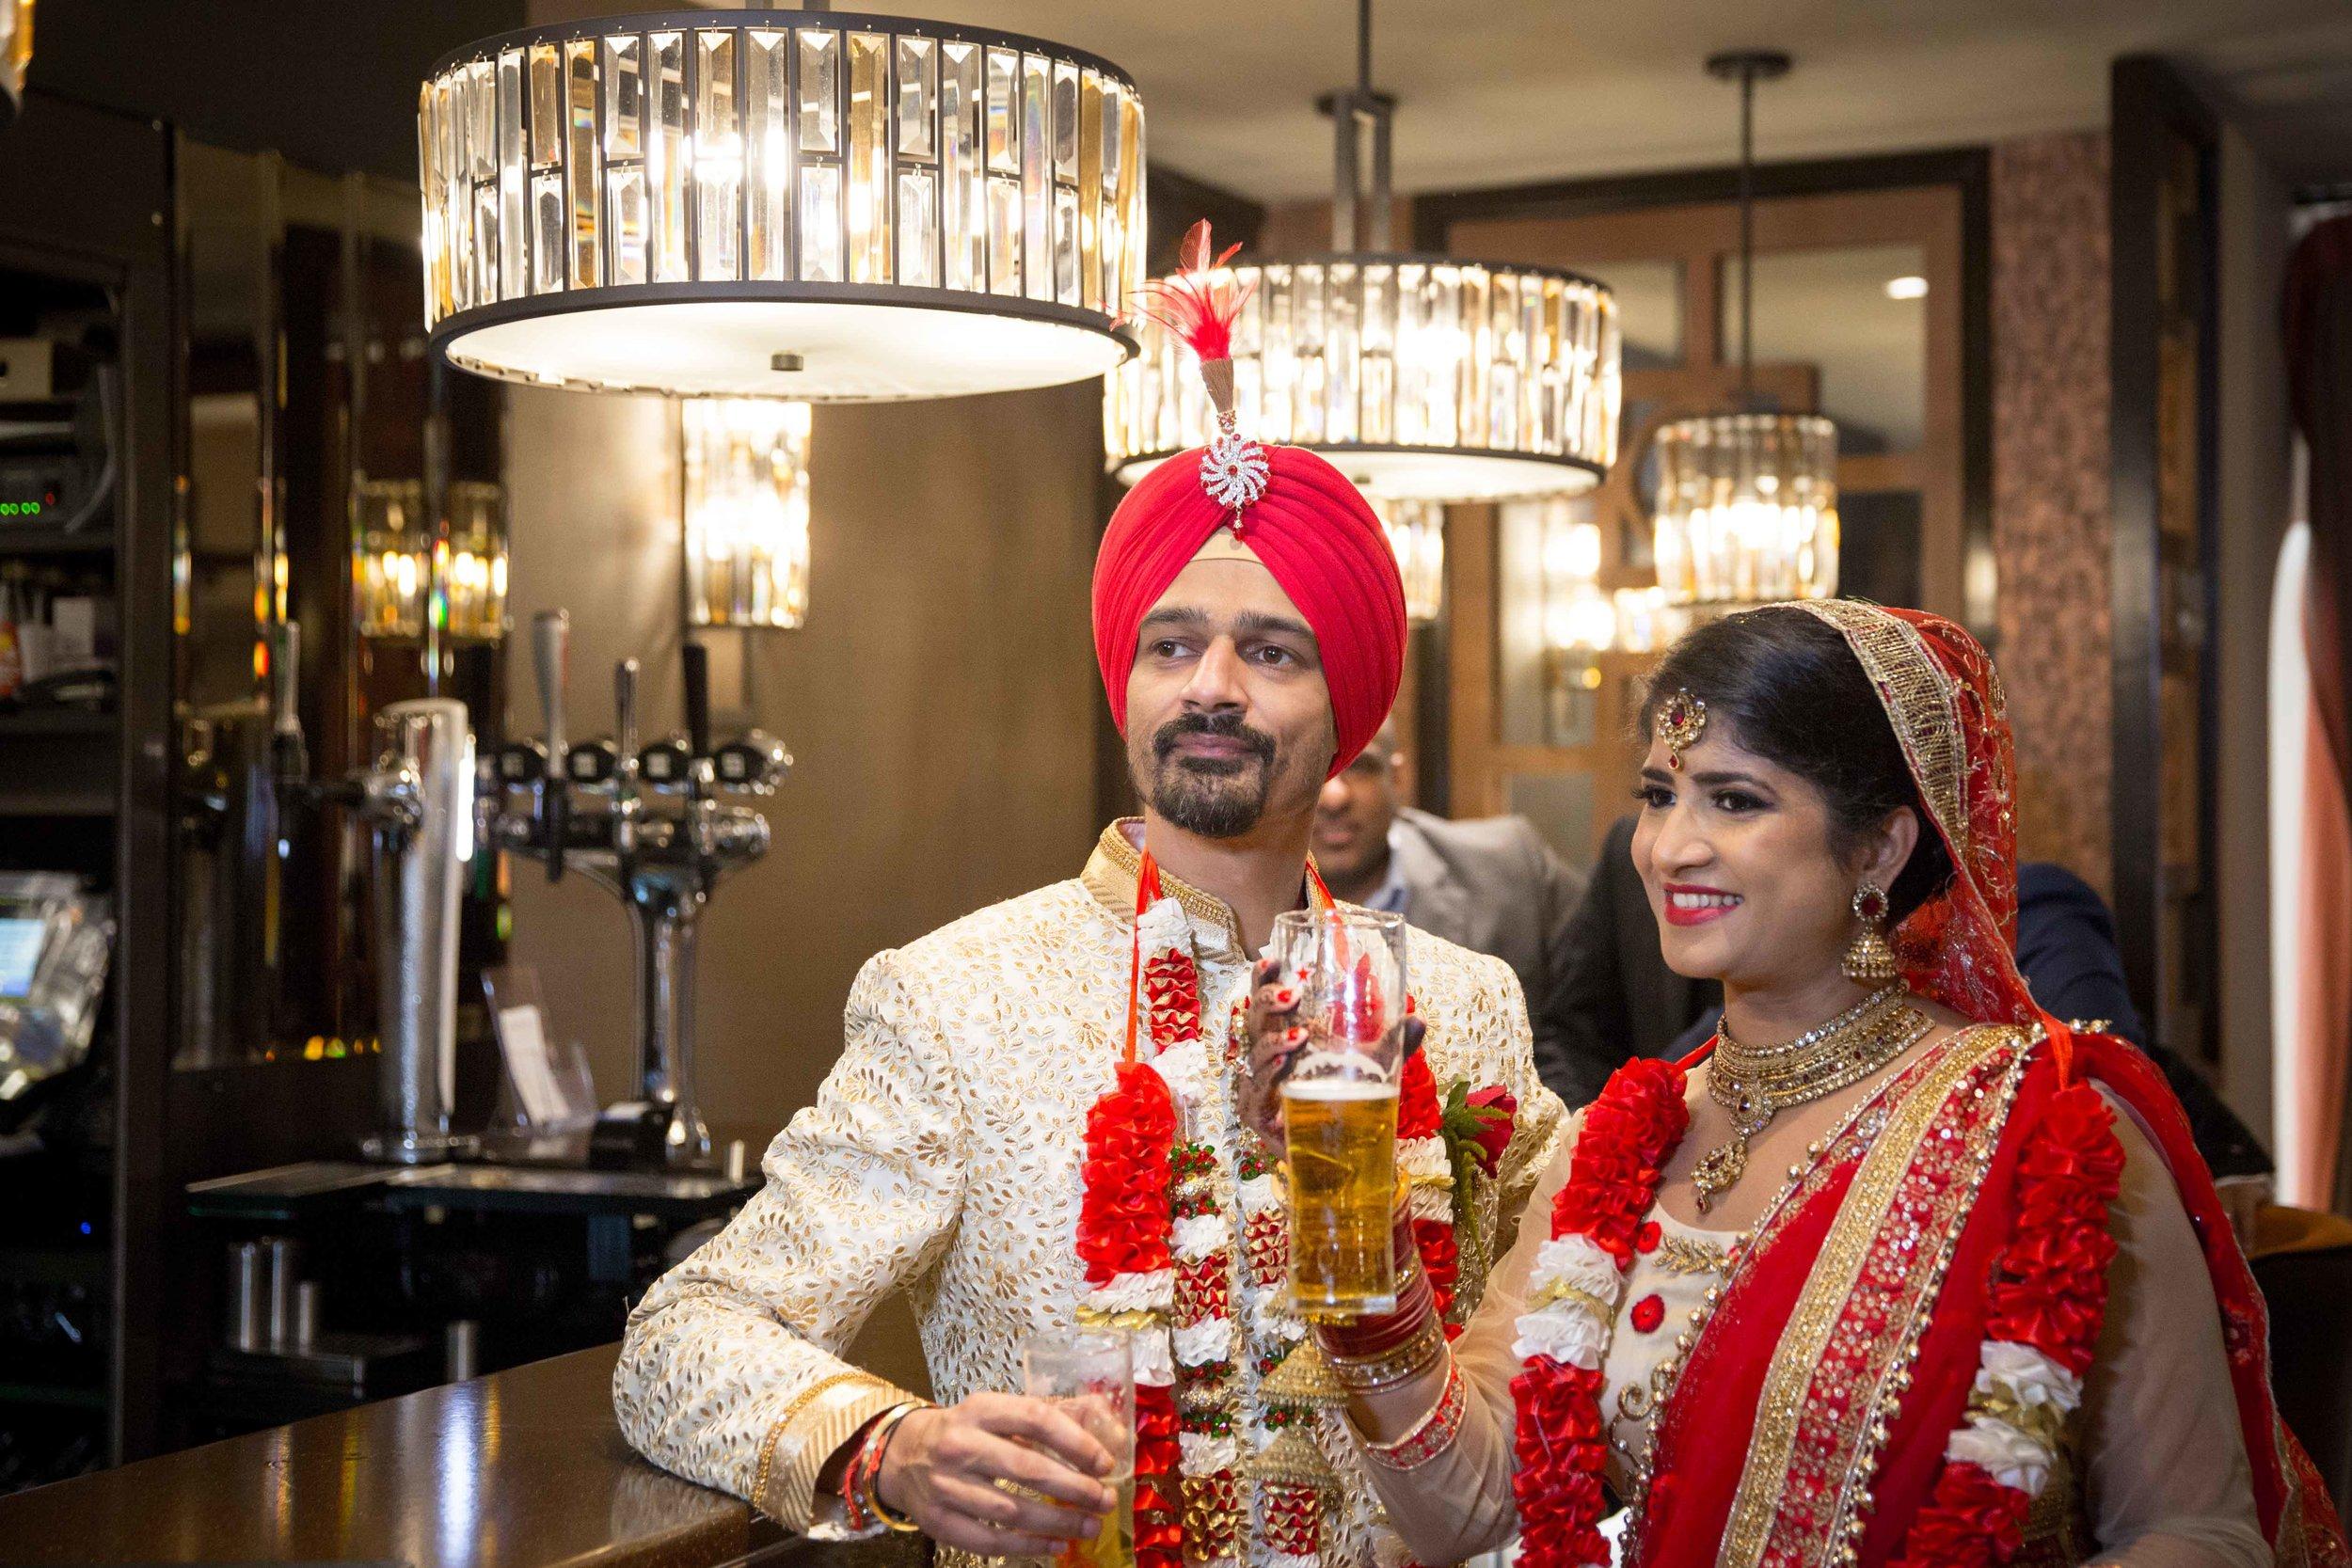 ramada-park-hall-hotel-birmingham-wolverhampton-hindu-wedding-asian-wedding-photography-natalia-smith-photography-31.jpg